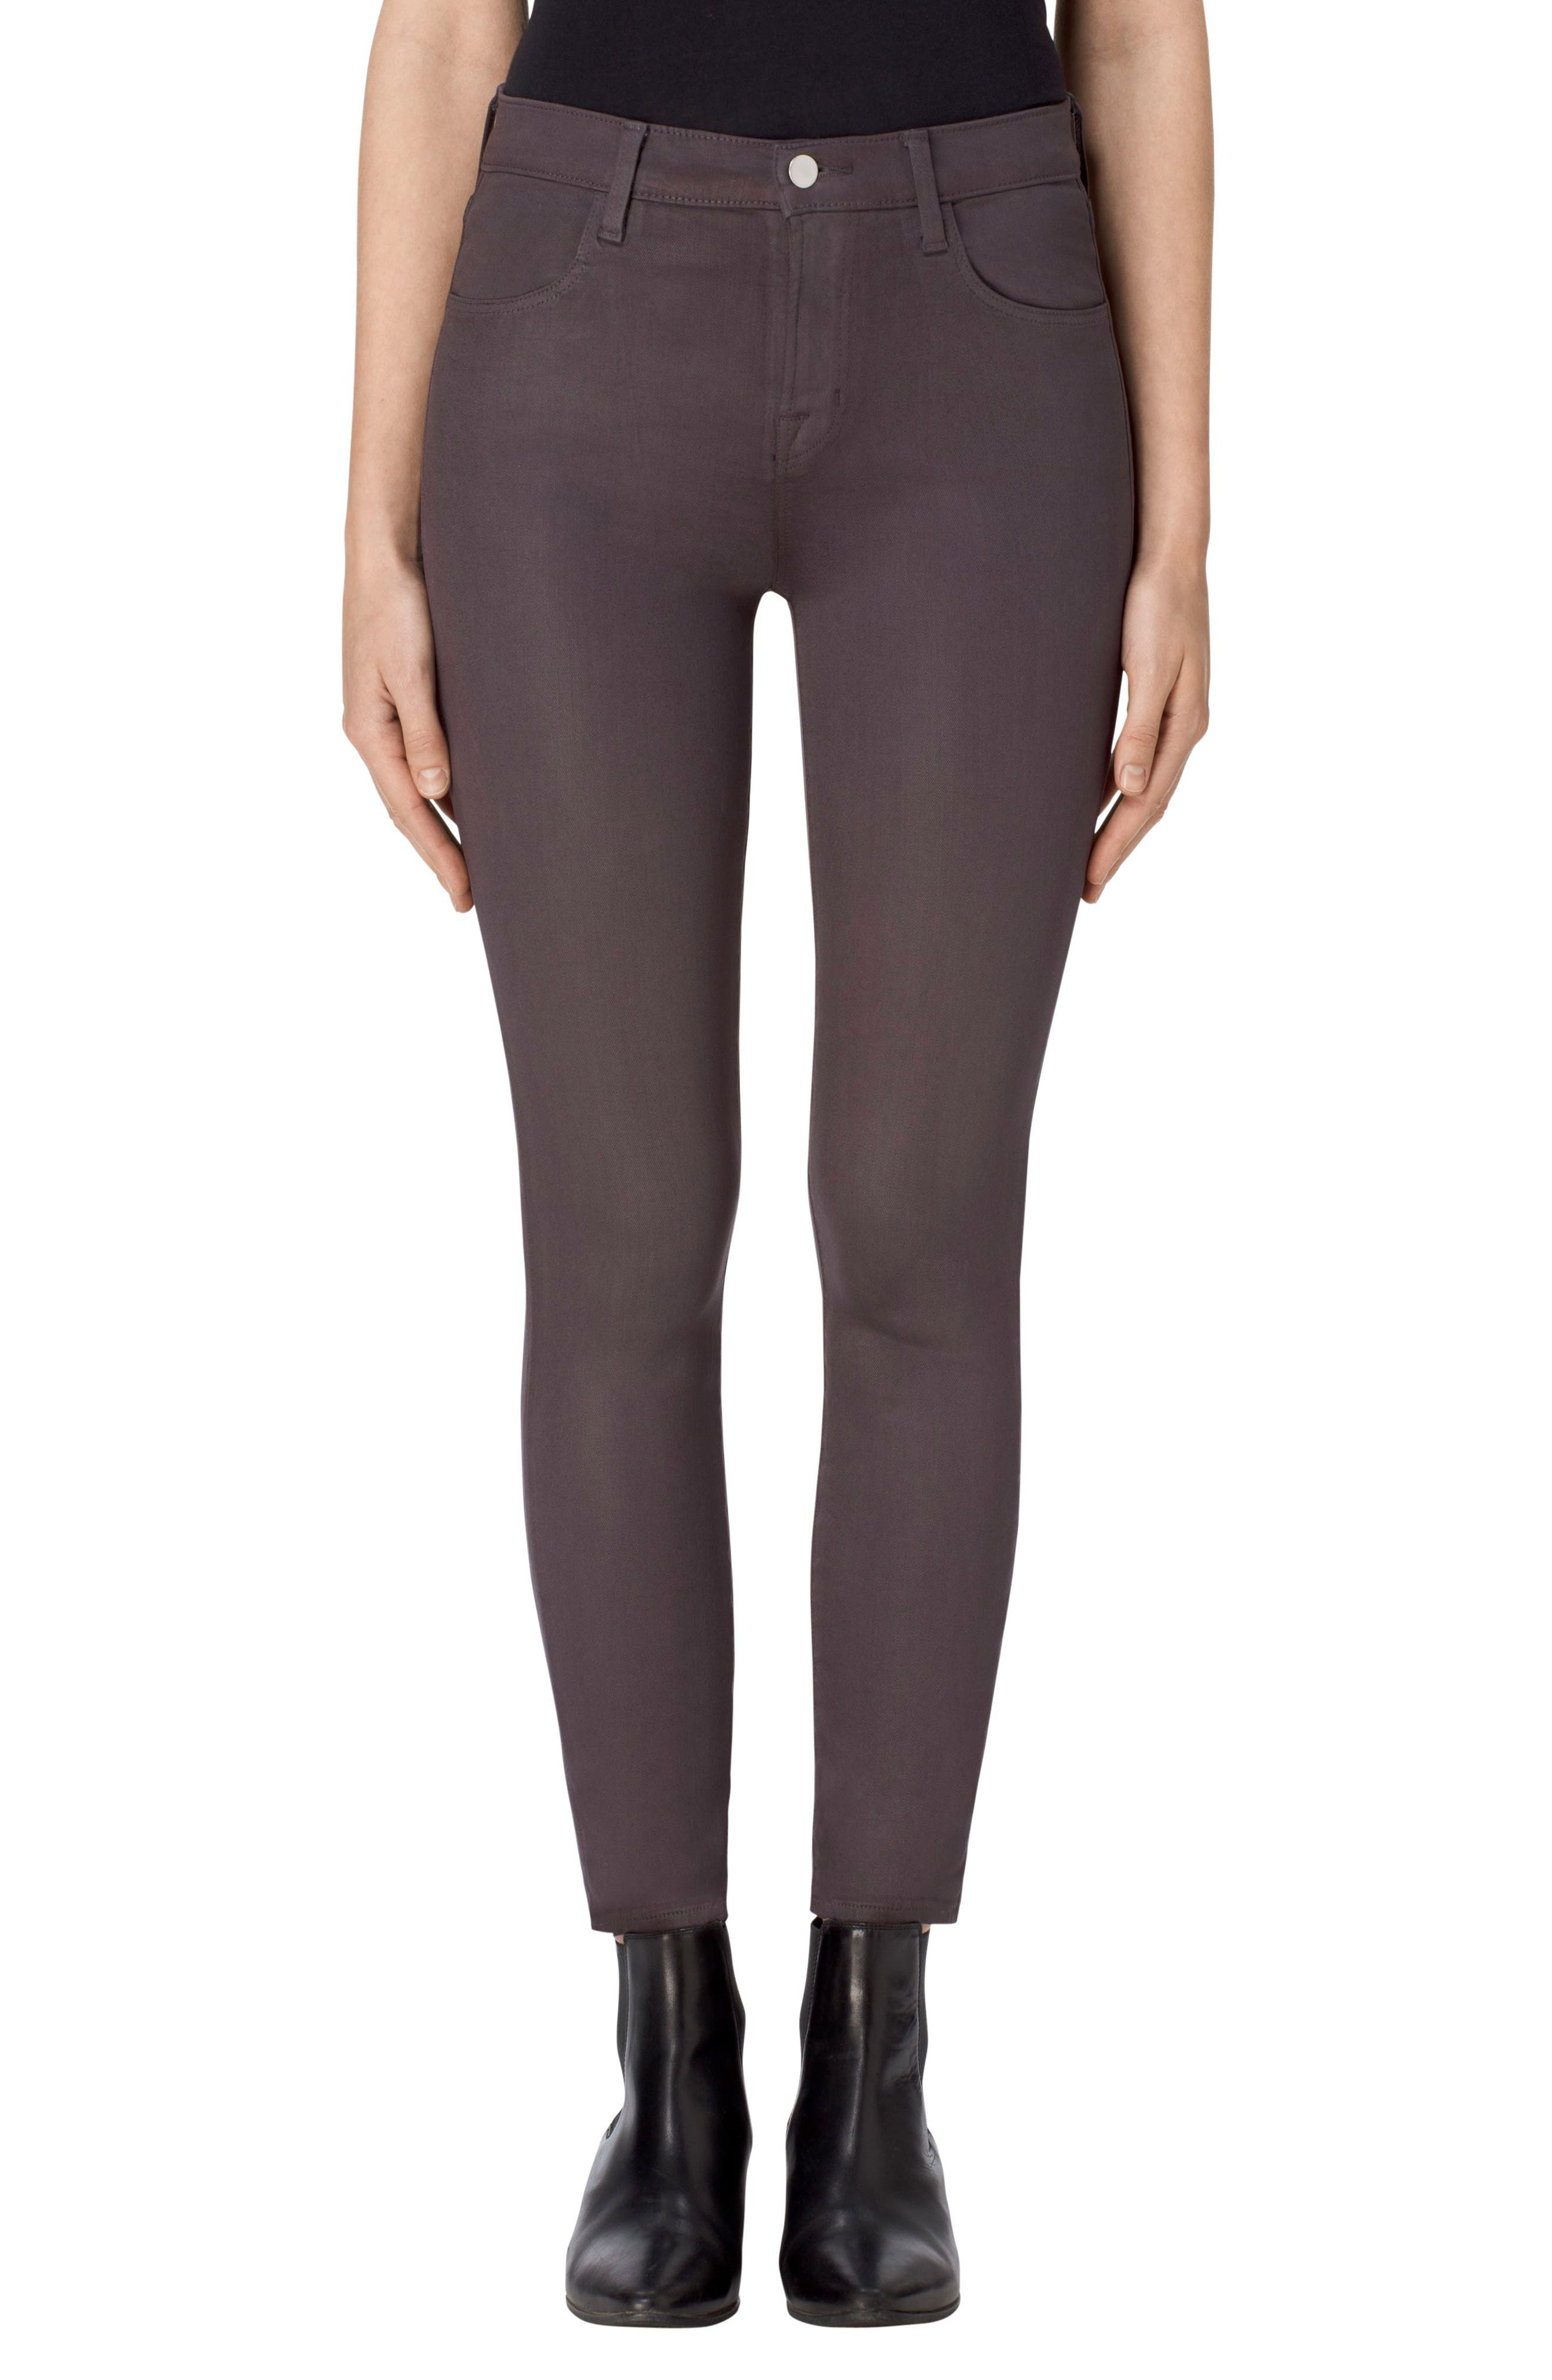 Alana High Waist Crop Skinny Jeans,                             Main thumbnail 1, color,                             Light Coated Chrome